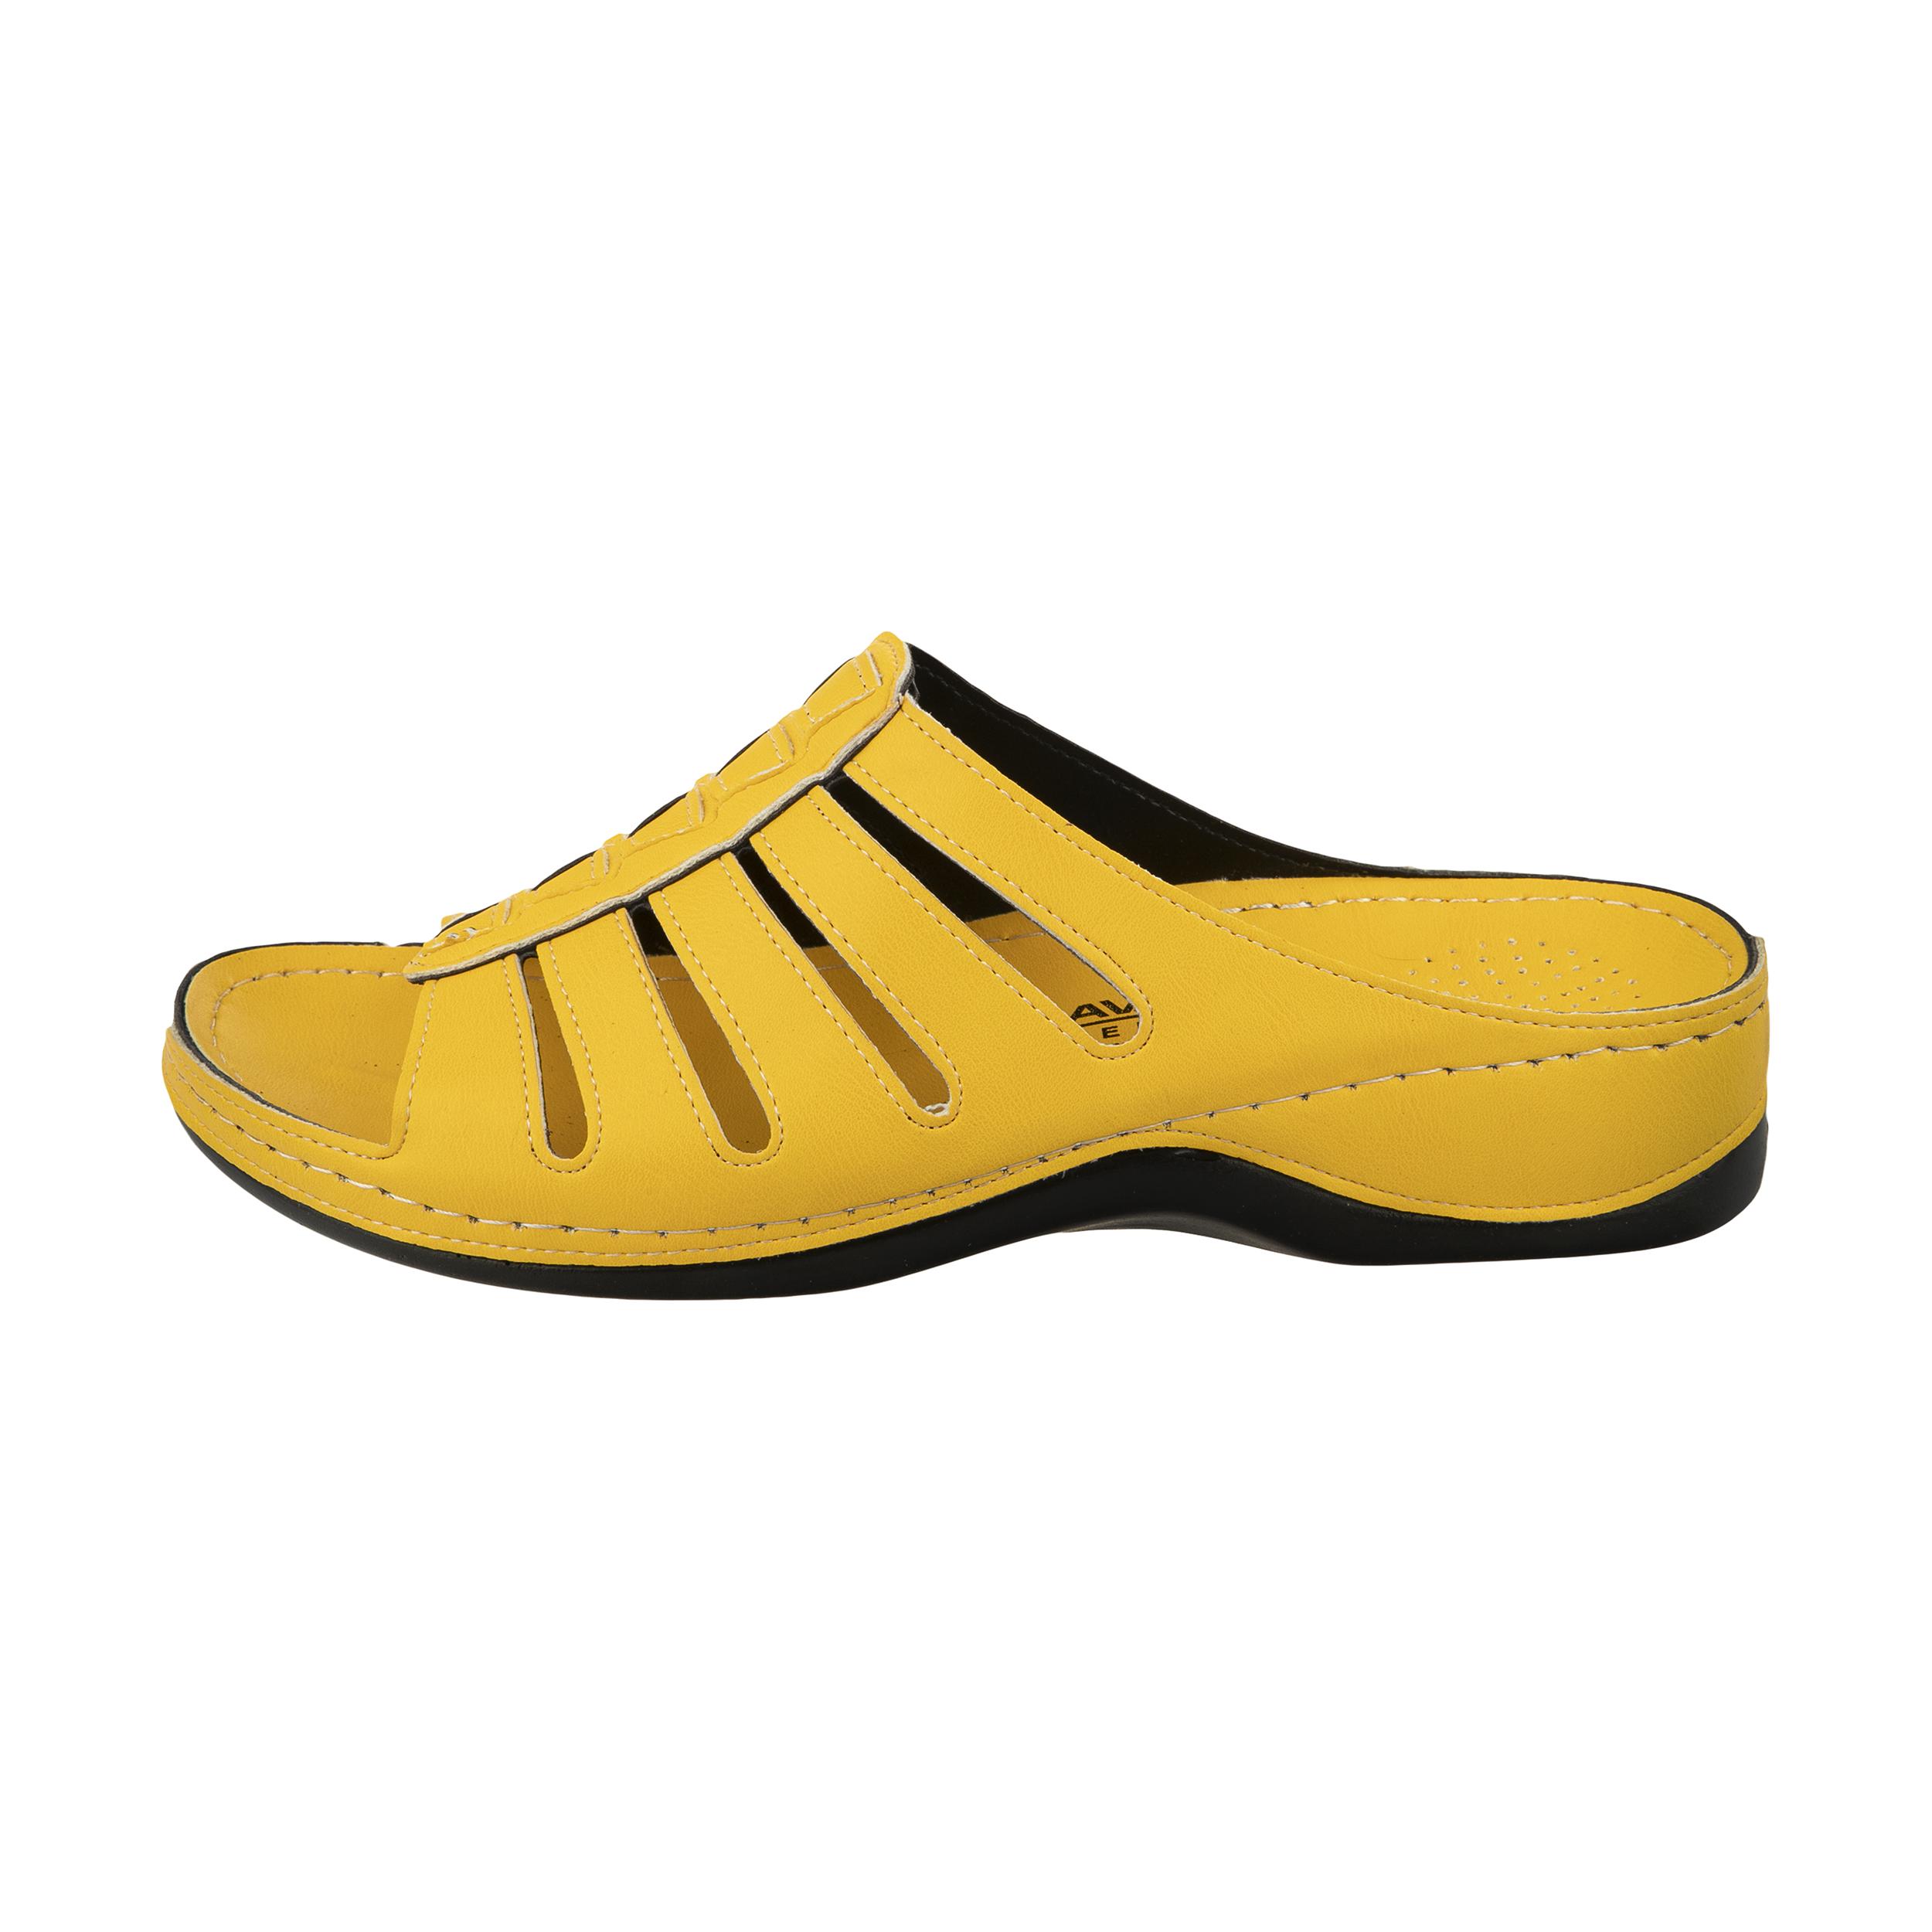 دمپایی زنانه آویده کد av-0304216 رنگ زرد -  - 2